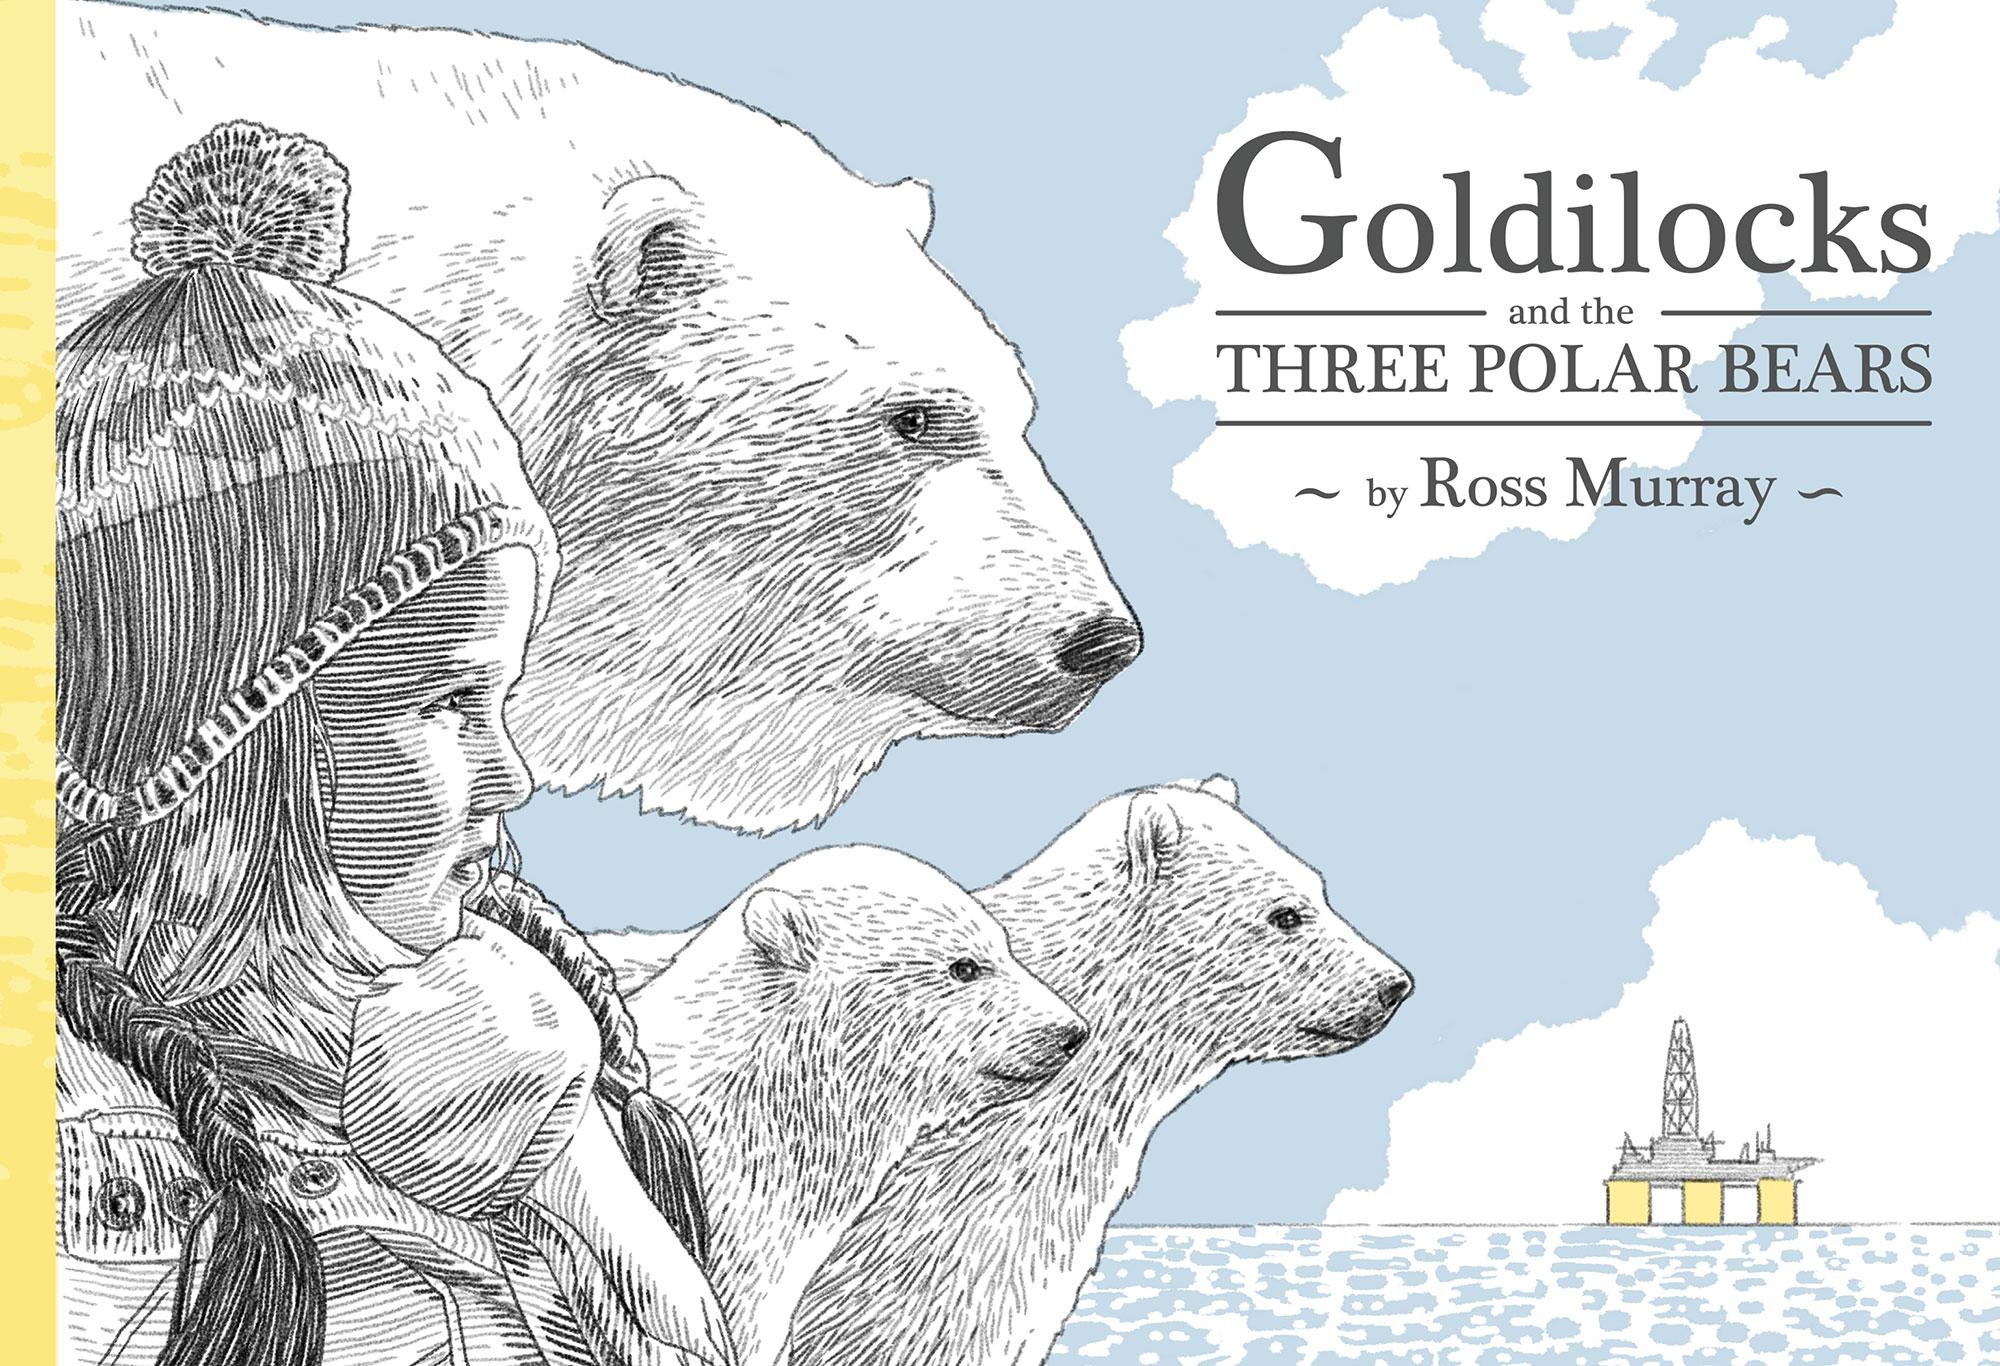 GoldilocksCoverWEBSITE.jpg